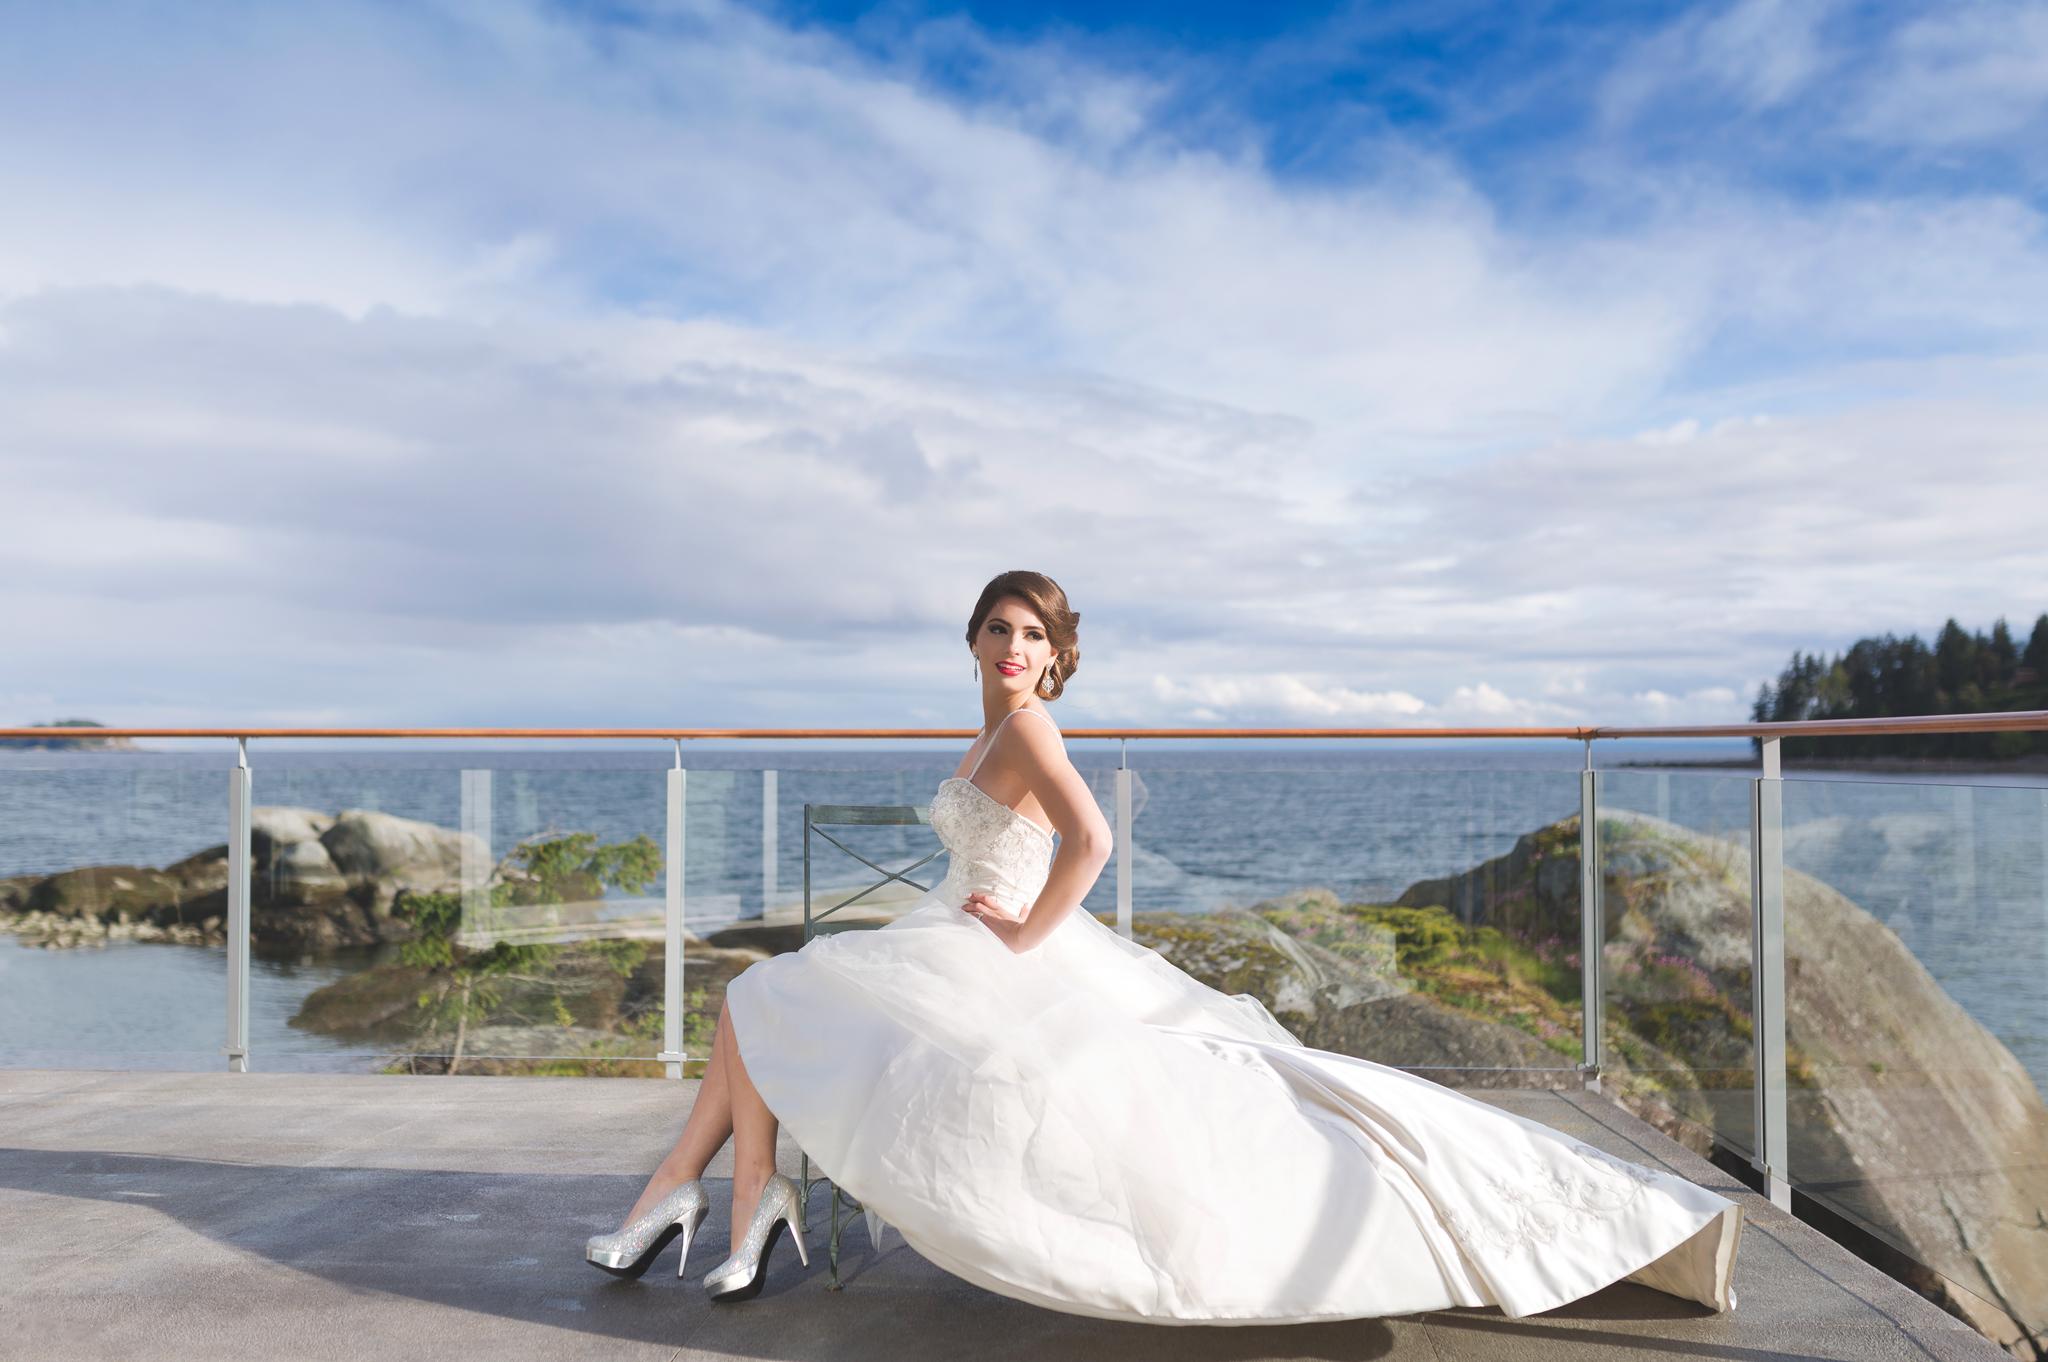 IMG_6821-BRIDAL-EDITORIAL-JENNIFER-PICARD-PHOTOGRAPHY-VANCOUVER-WEDDING-PHOTOGRAPHER.jpg